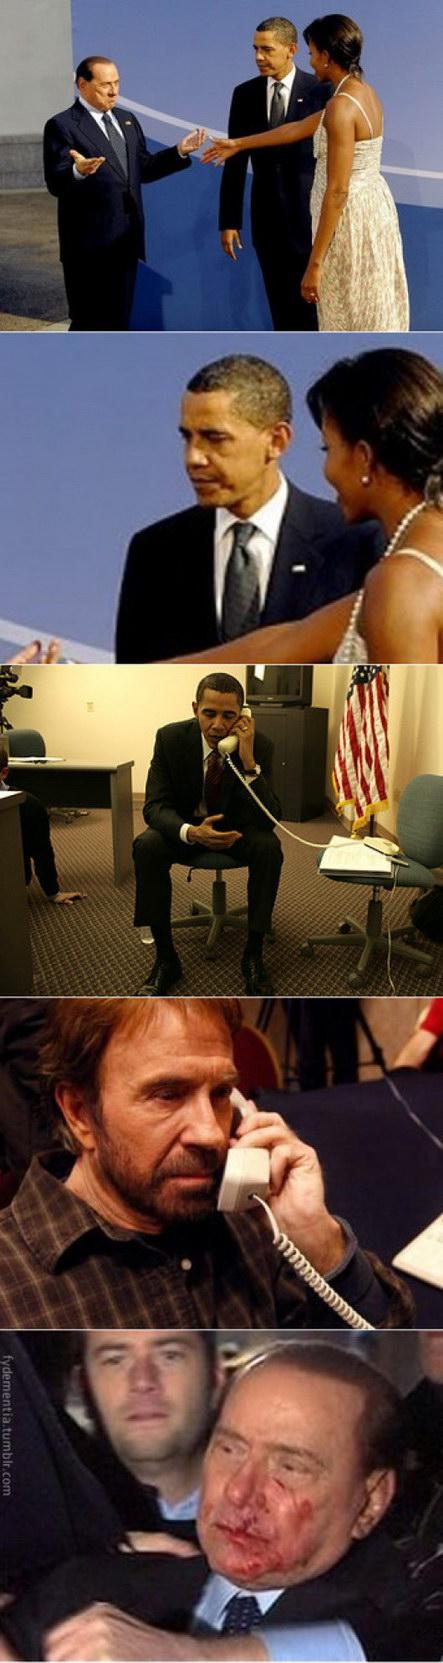 obama-ckuck-berlusconi